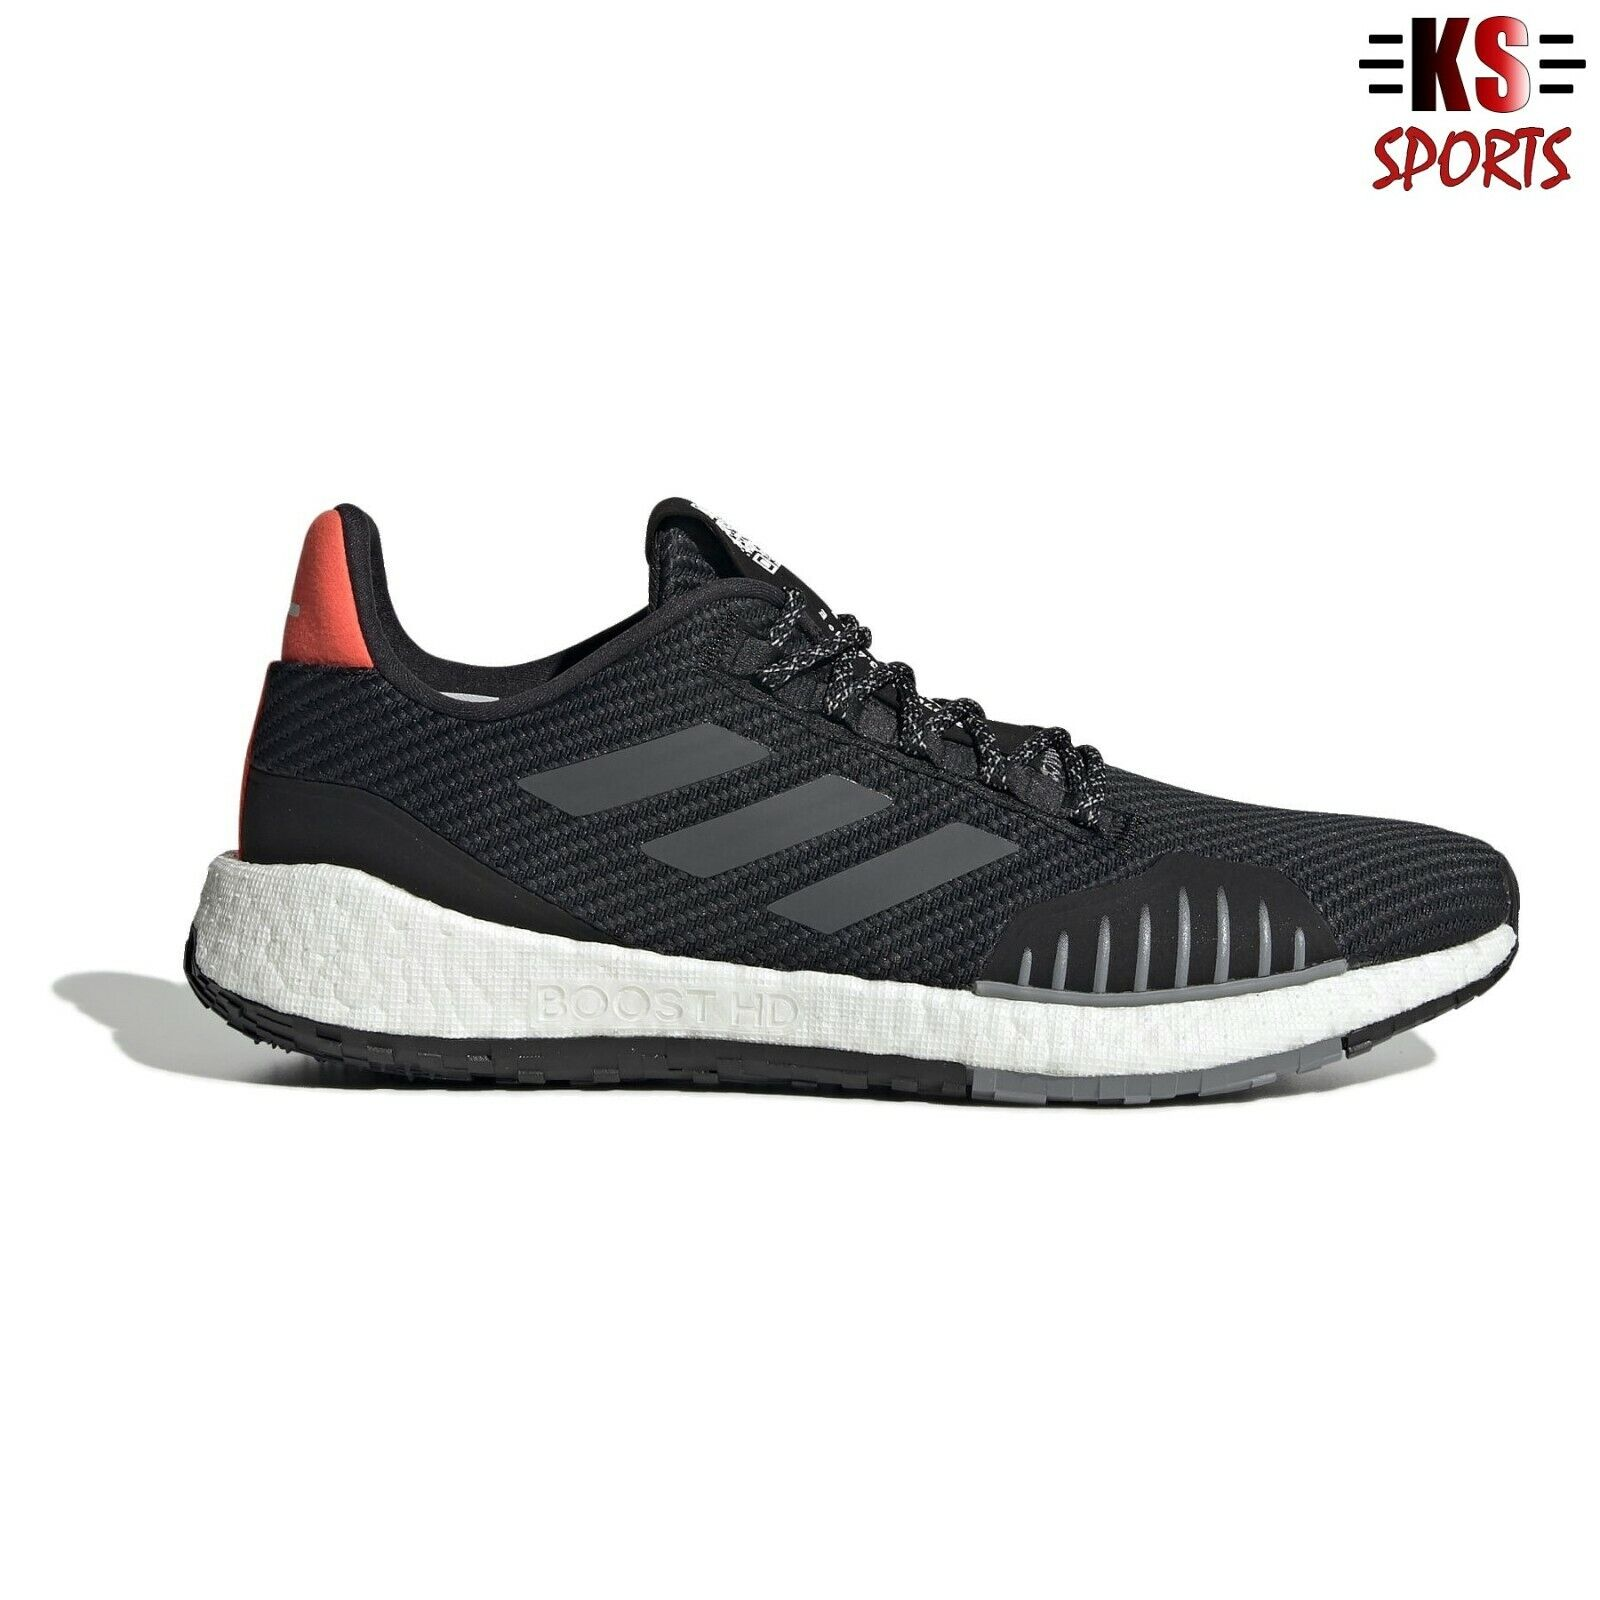 Adidas PulseBoost HD Winter Men's Running Shoes FU7321